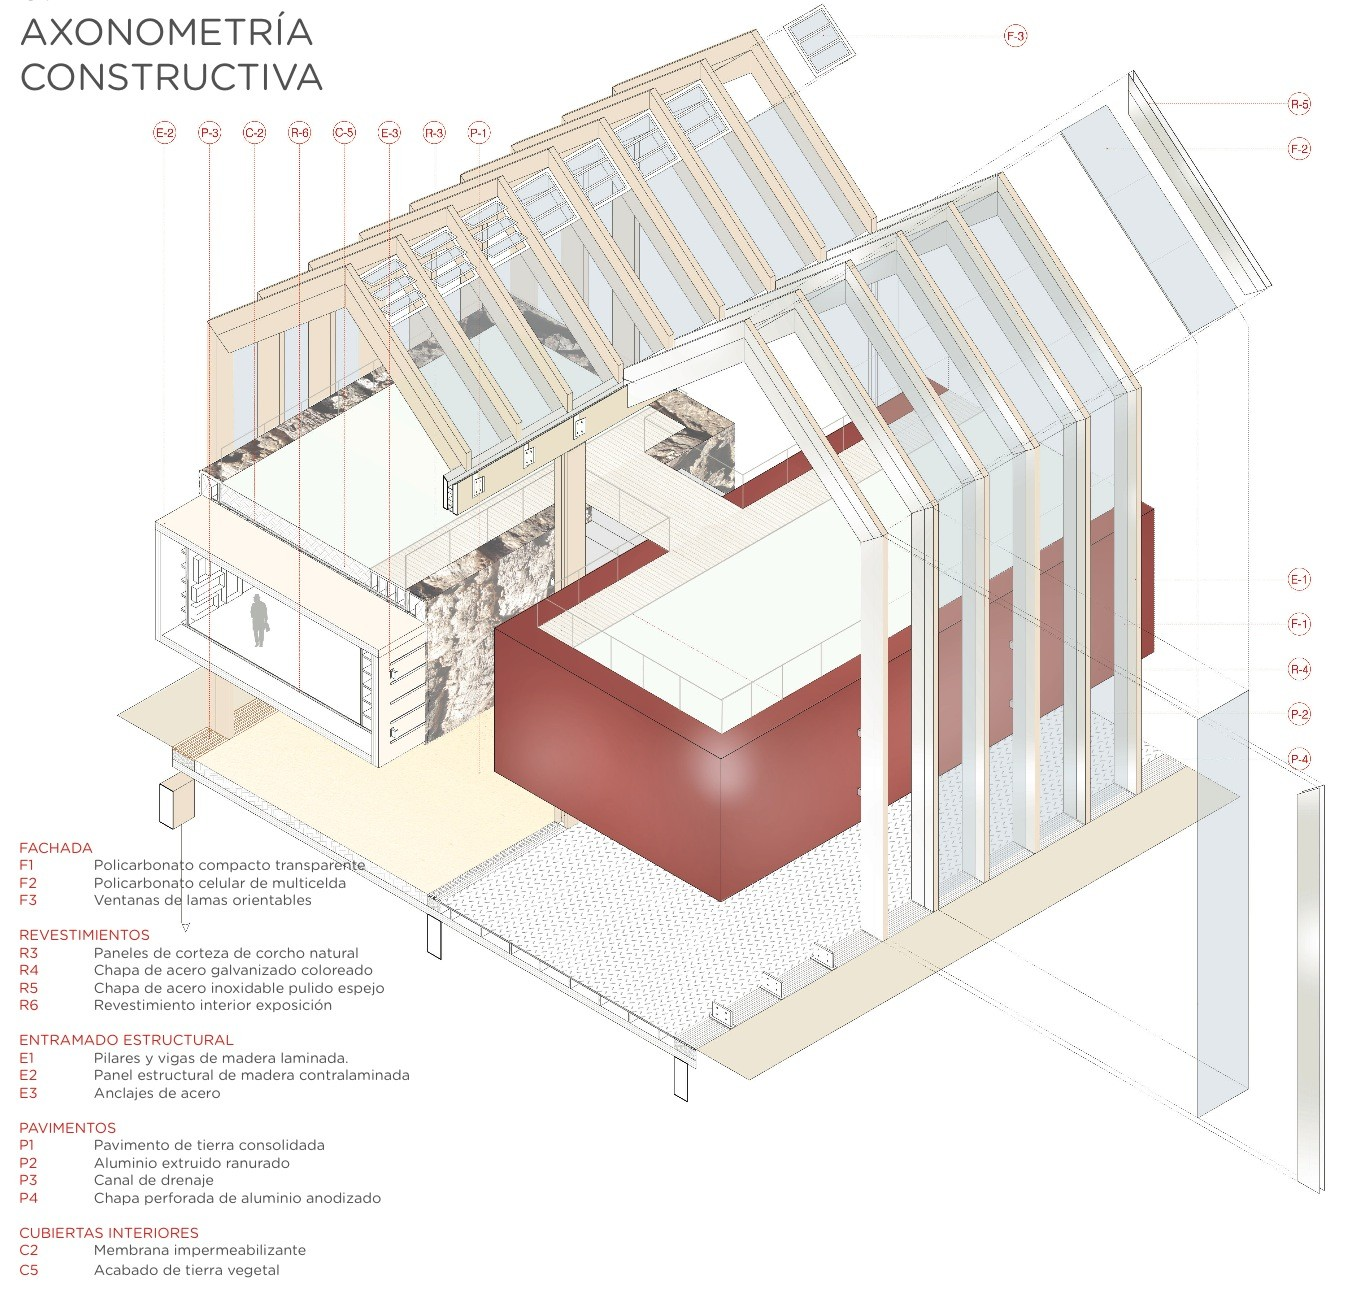 Detalle Axonométrico. Imágen © b720 Arquitectos